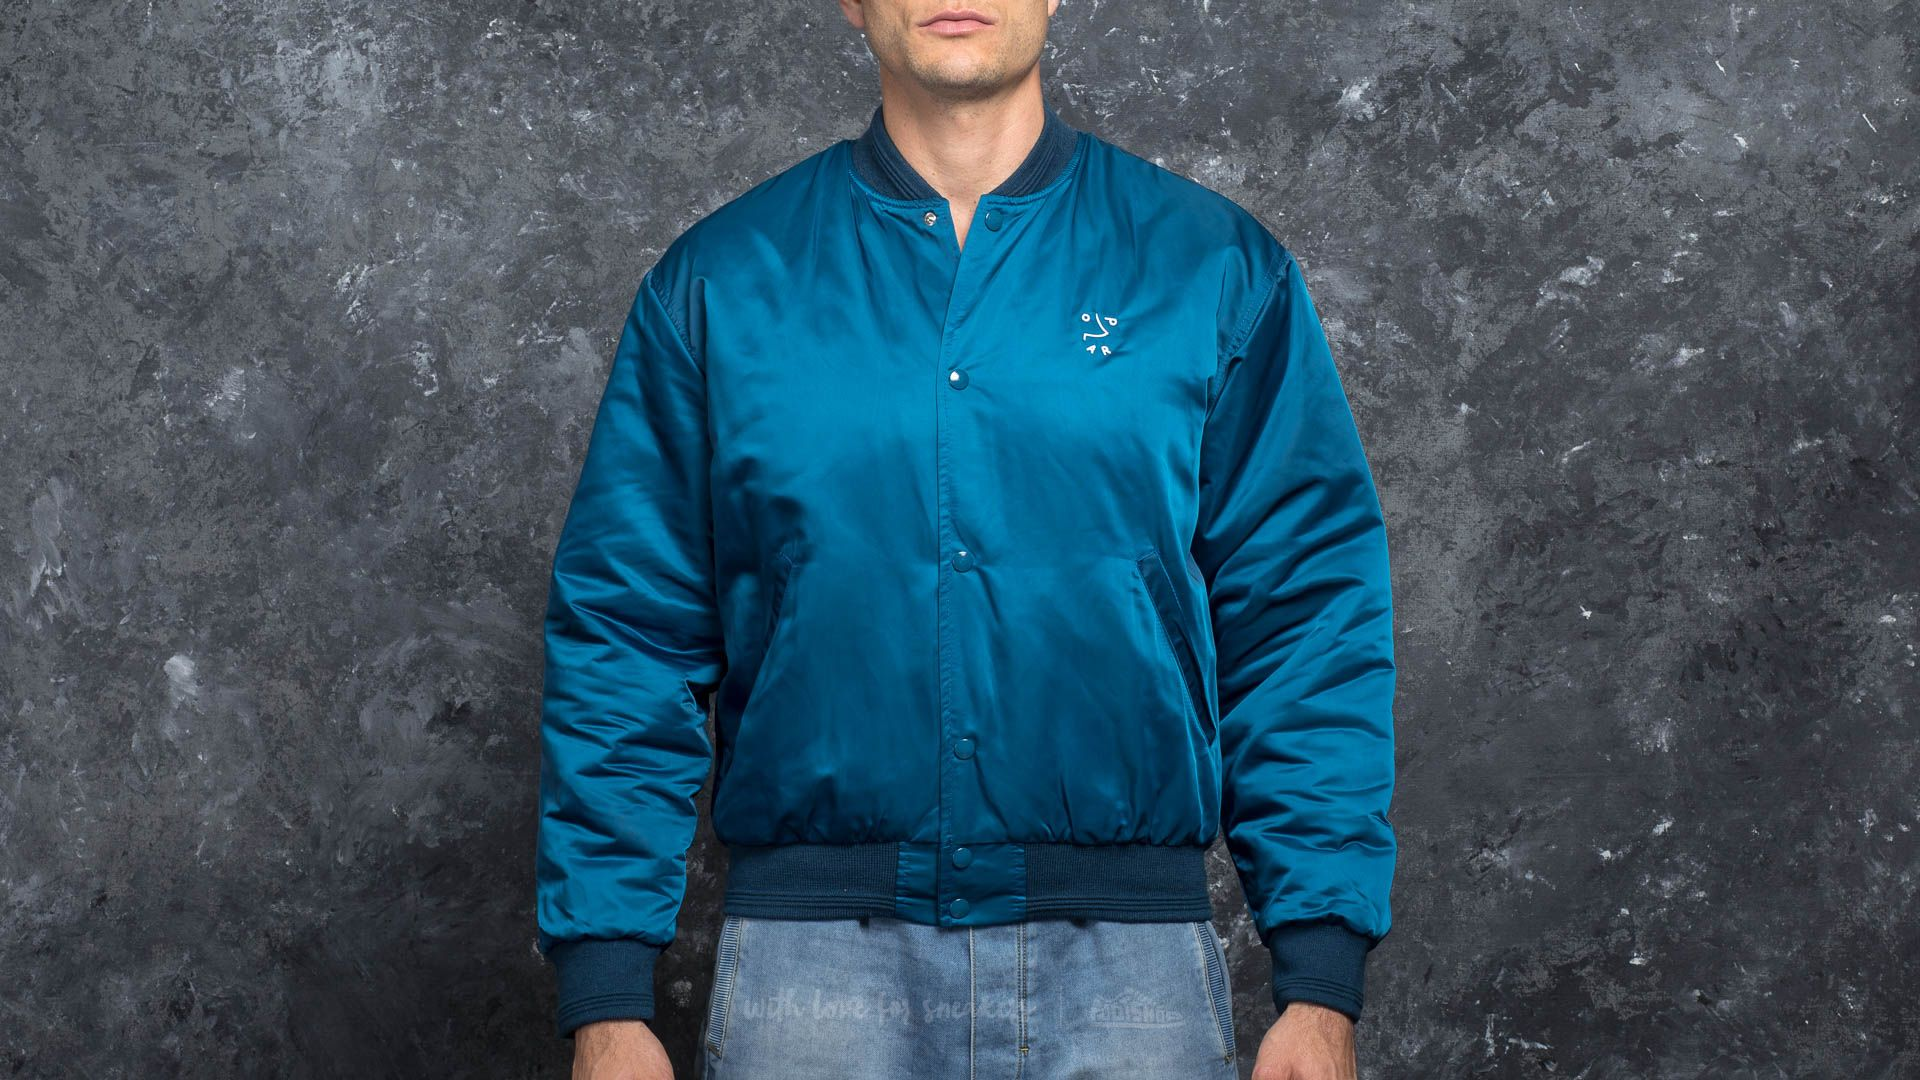 b5673e1f0 Polar Skate Co. College Jacket Petrol Navy   Footshop